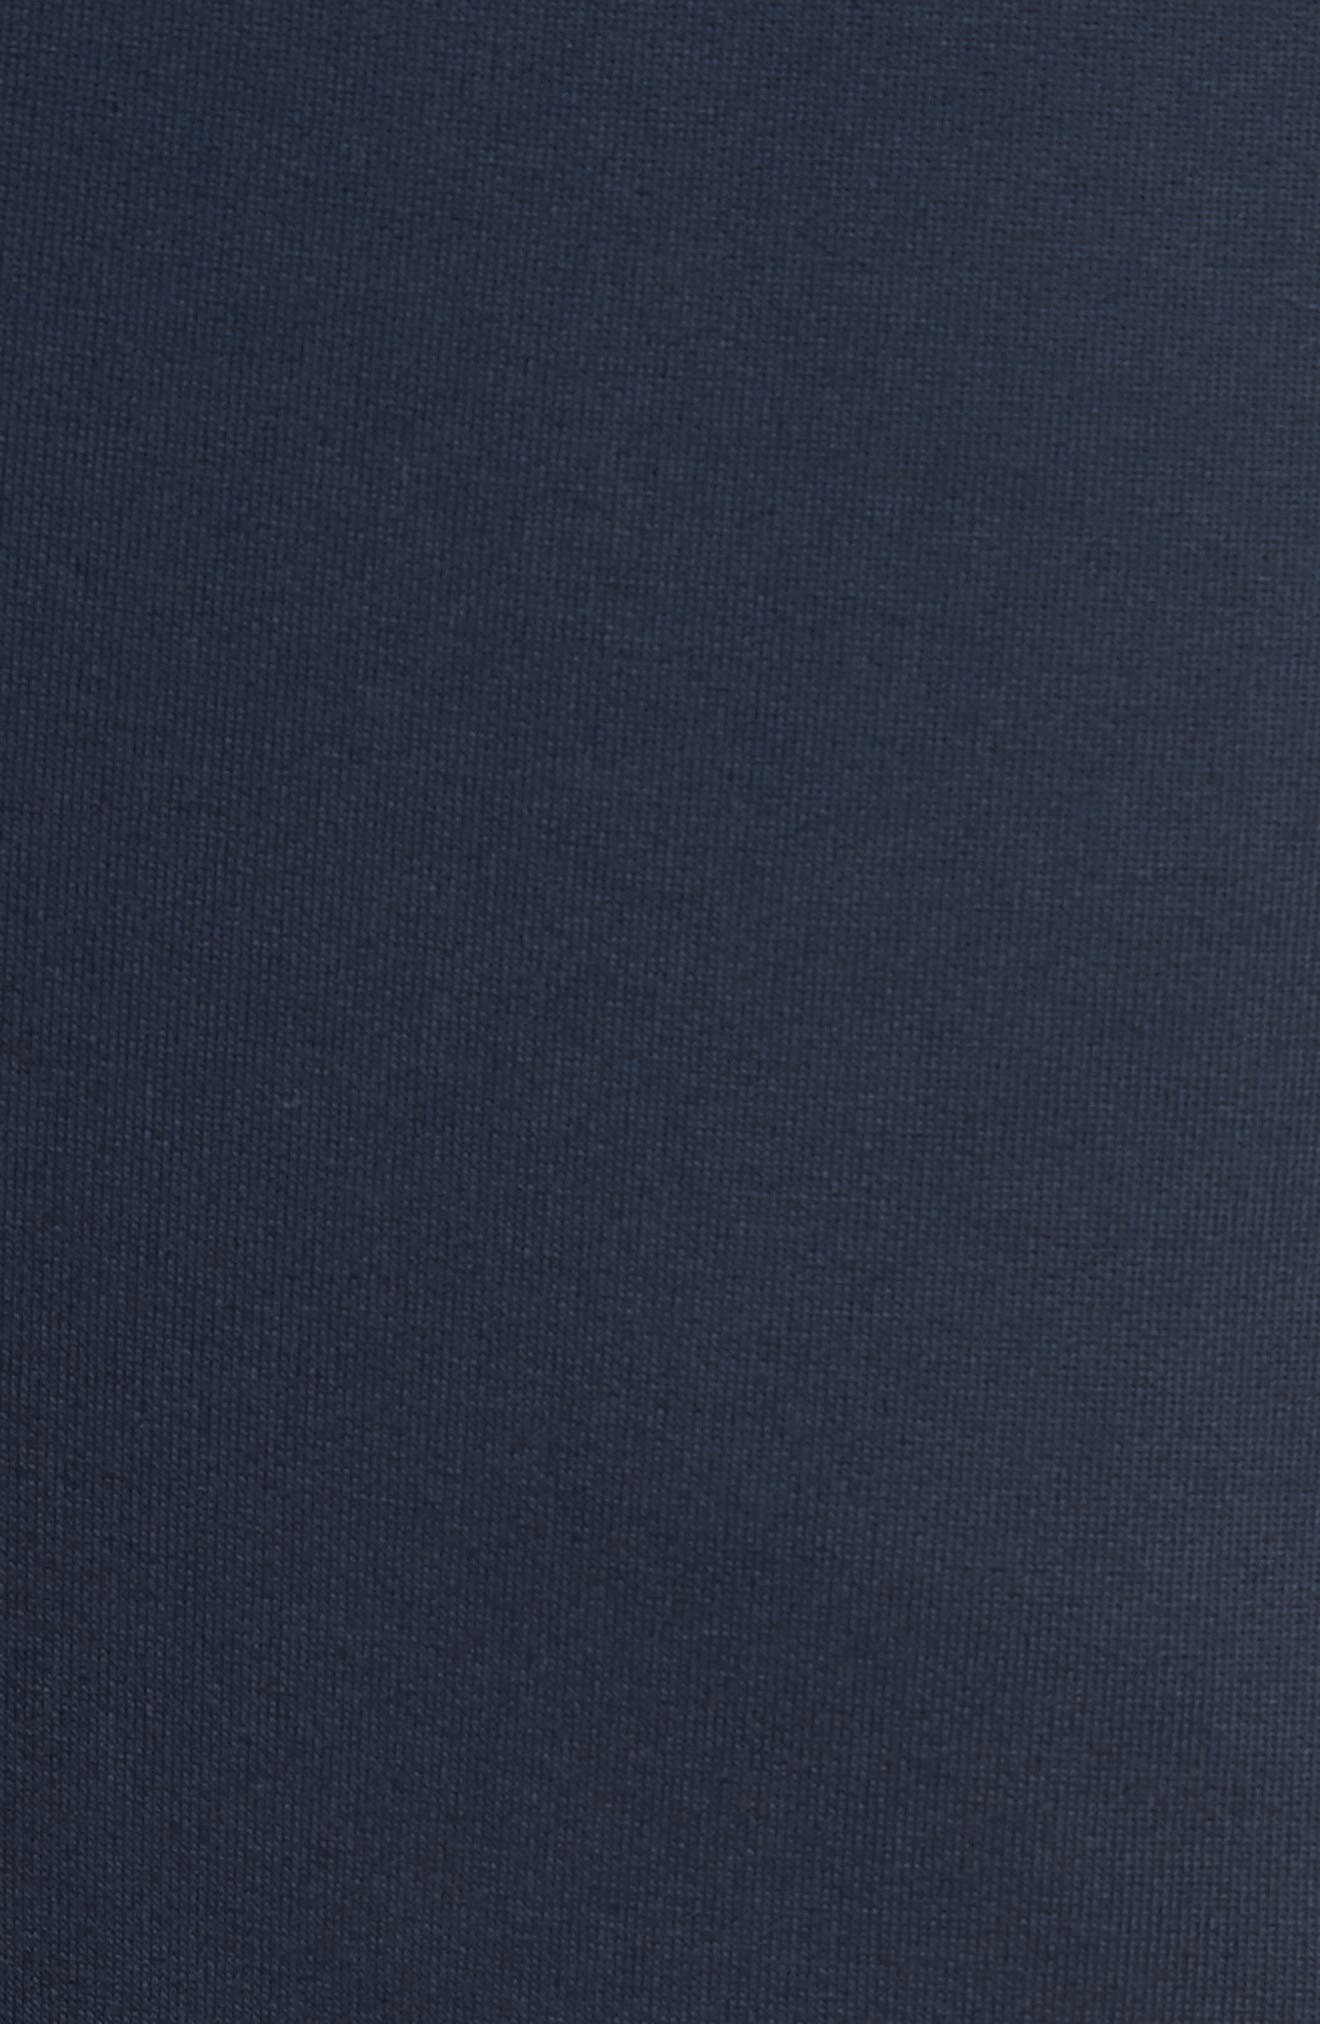 Modal Blend Lounge Pants,                             Alternate thumbnail 5, color,                             Ink